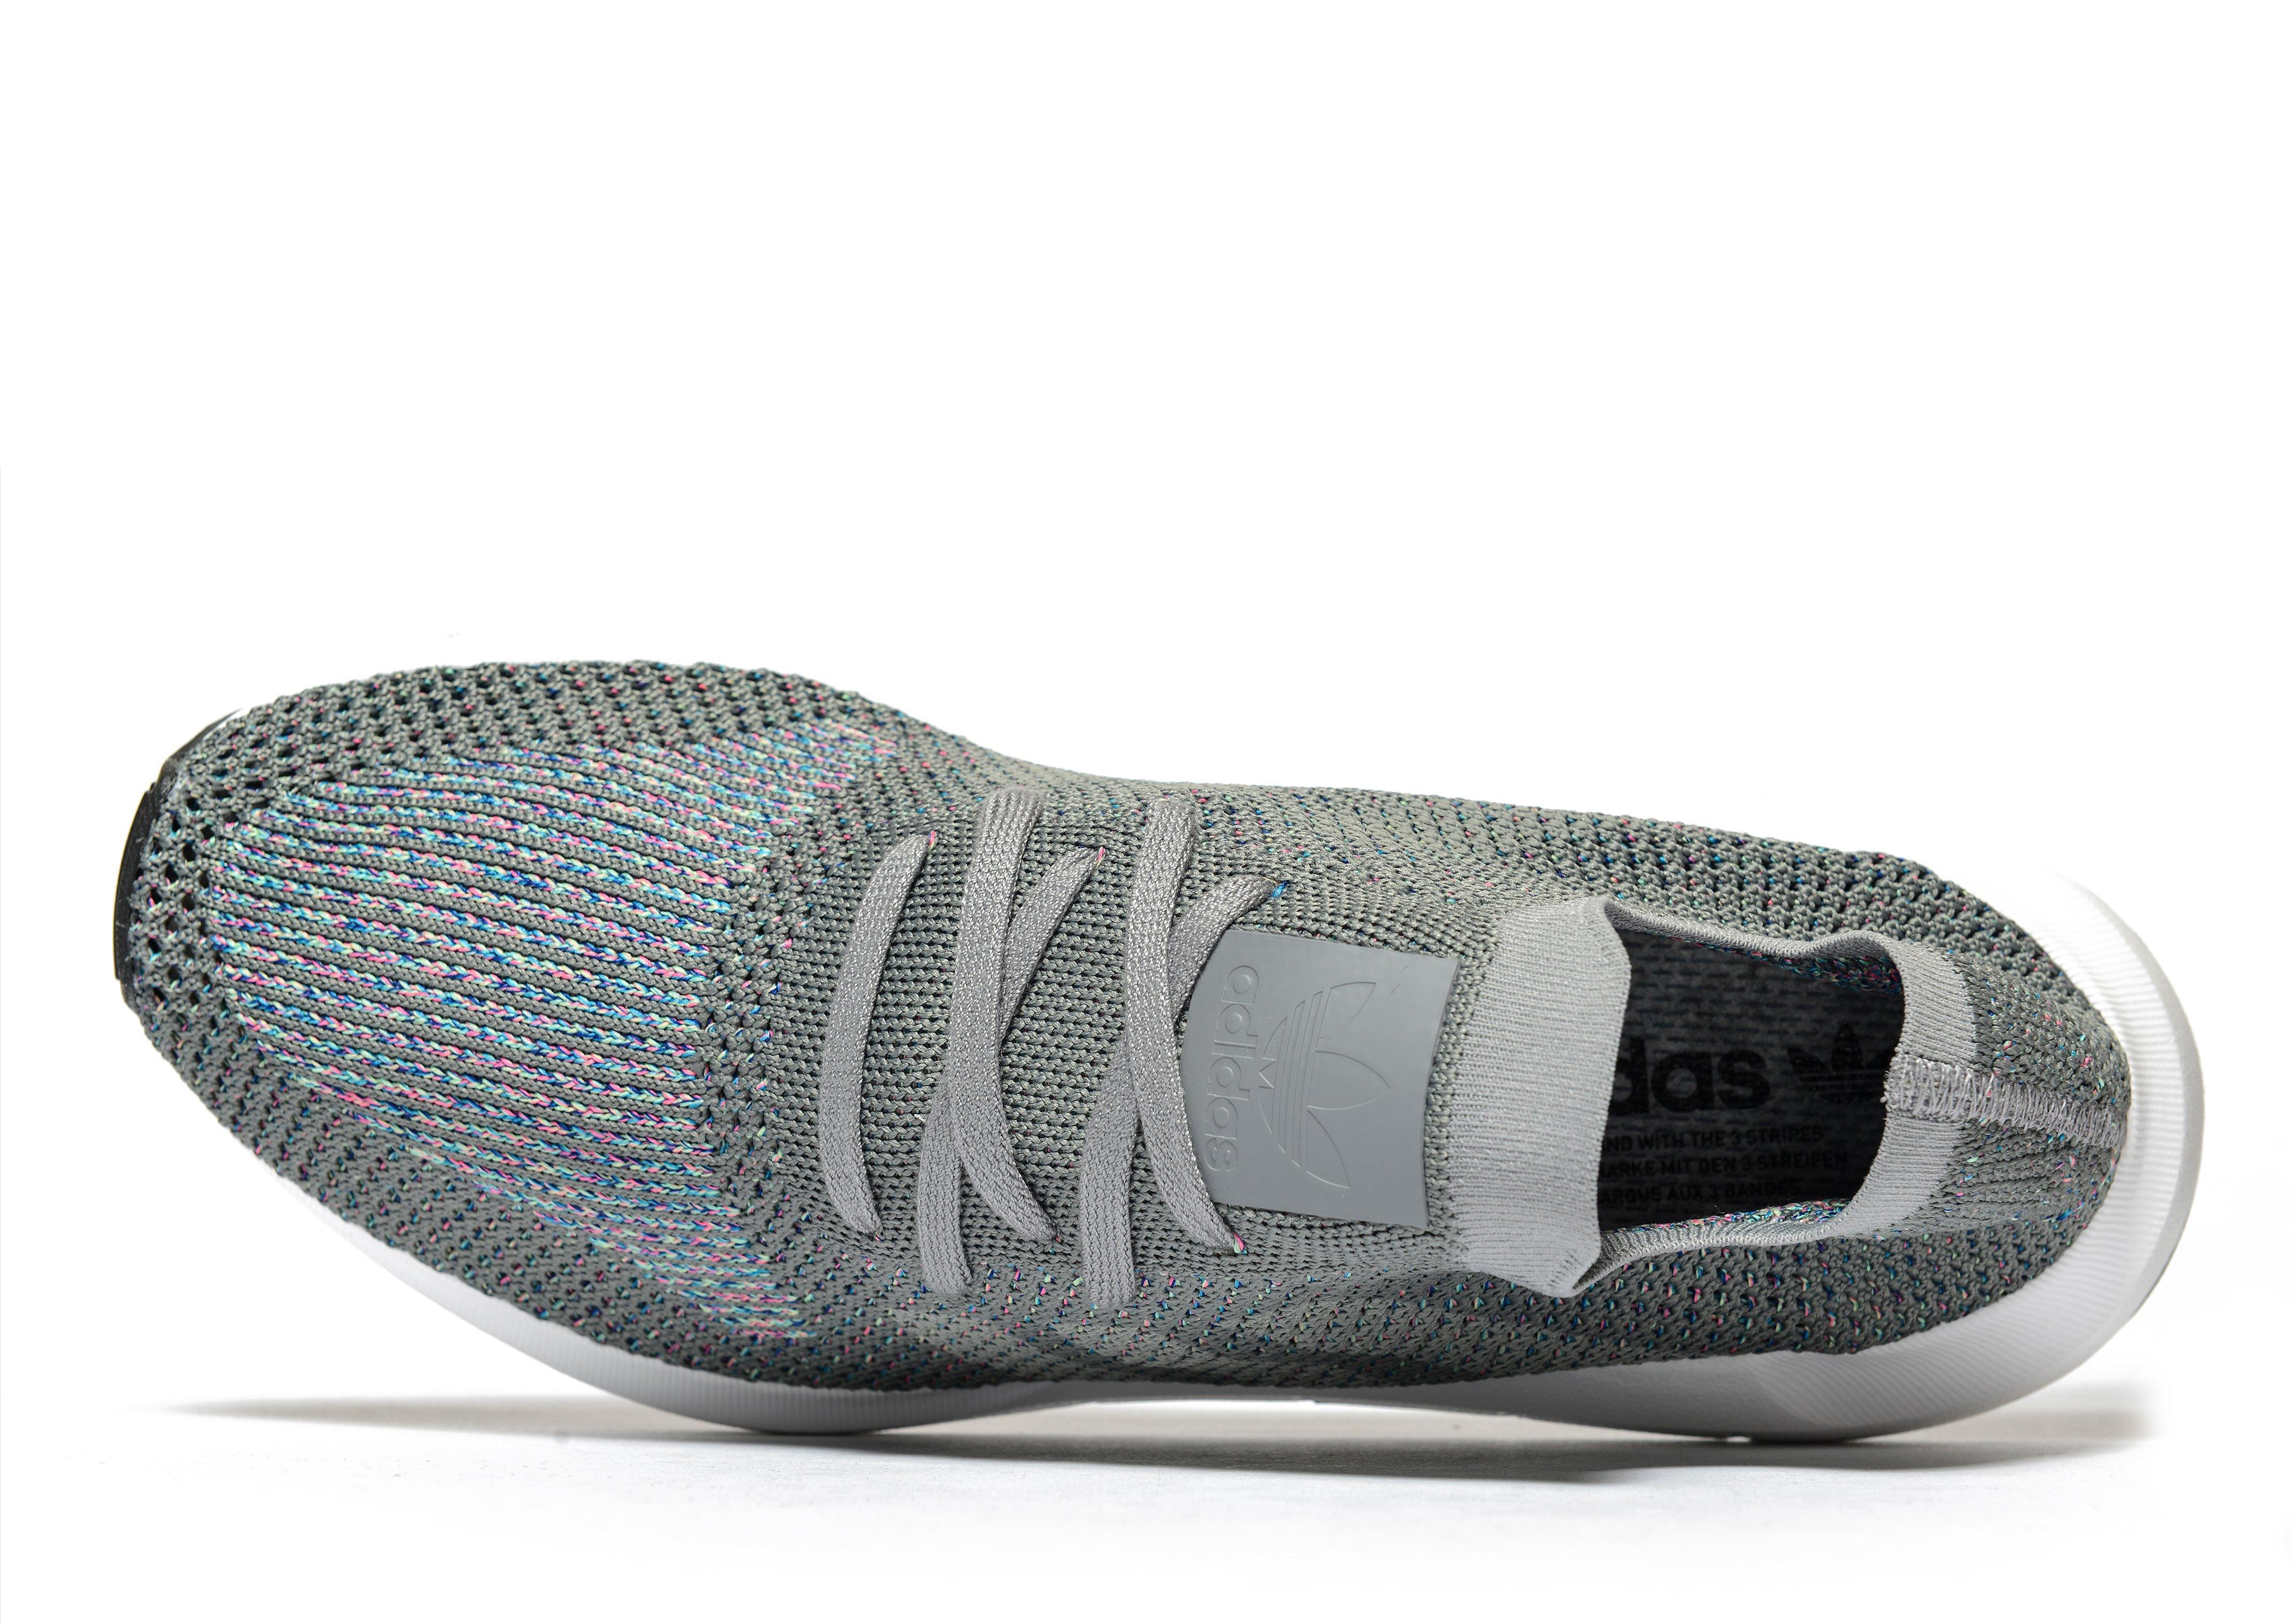 factory authentic ae8fc e710f Lyst - Adidas Originals Swift Run Primeknit in Gray for Men